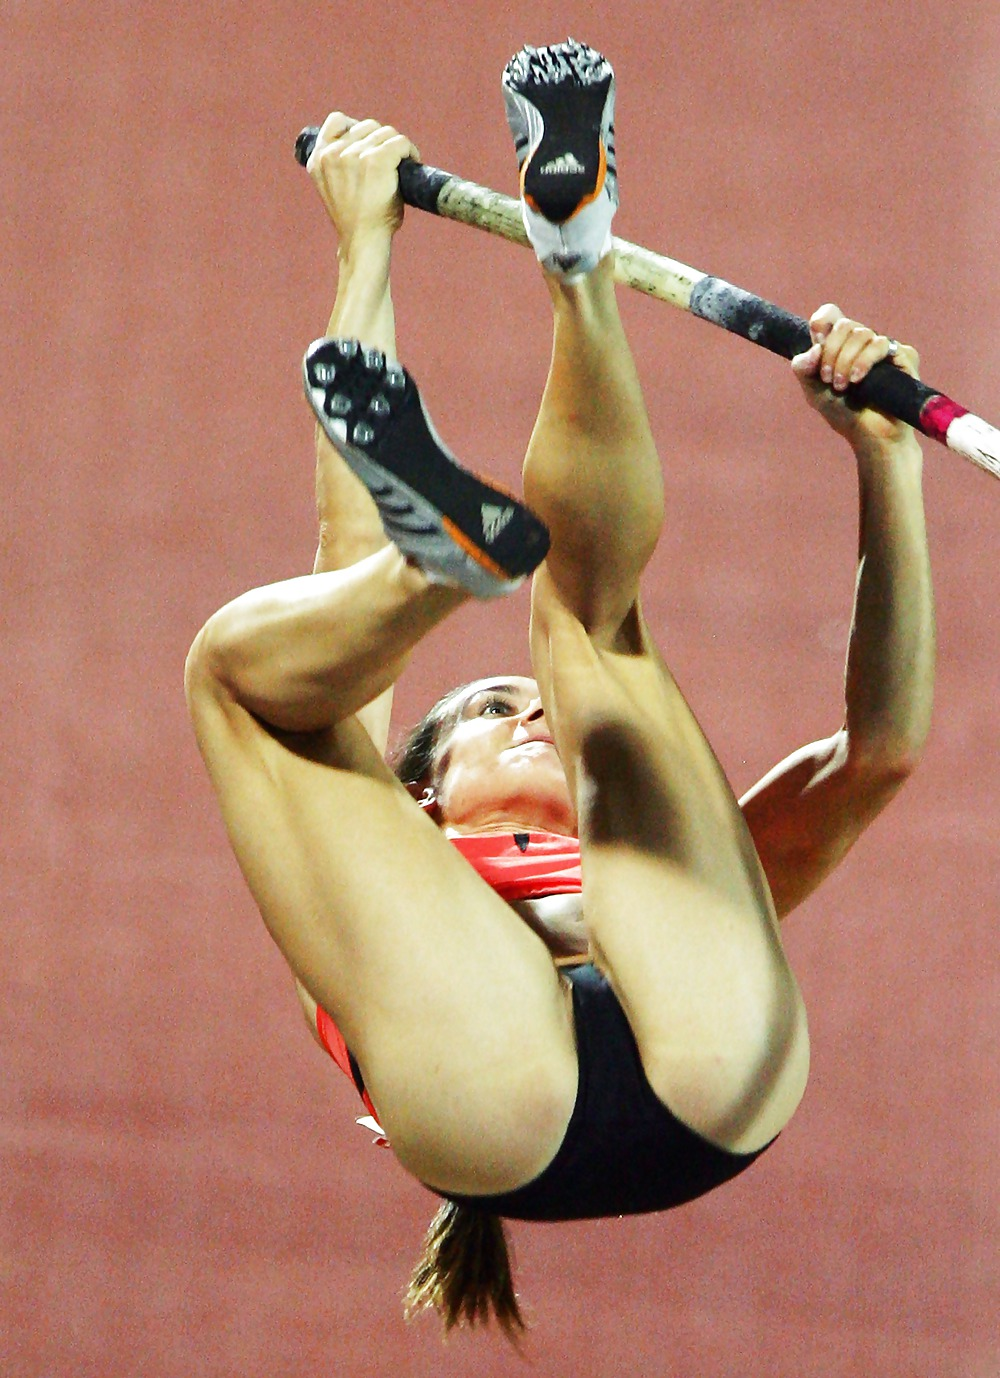 сайт спортсменки с бритой мандой фото представьте